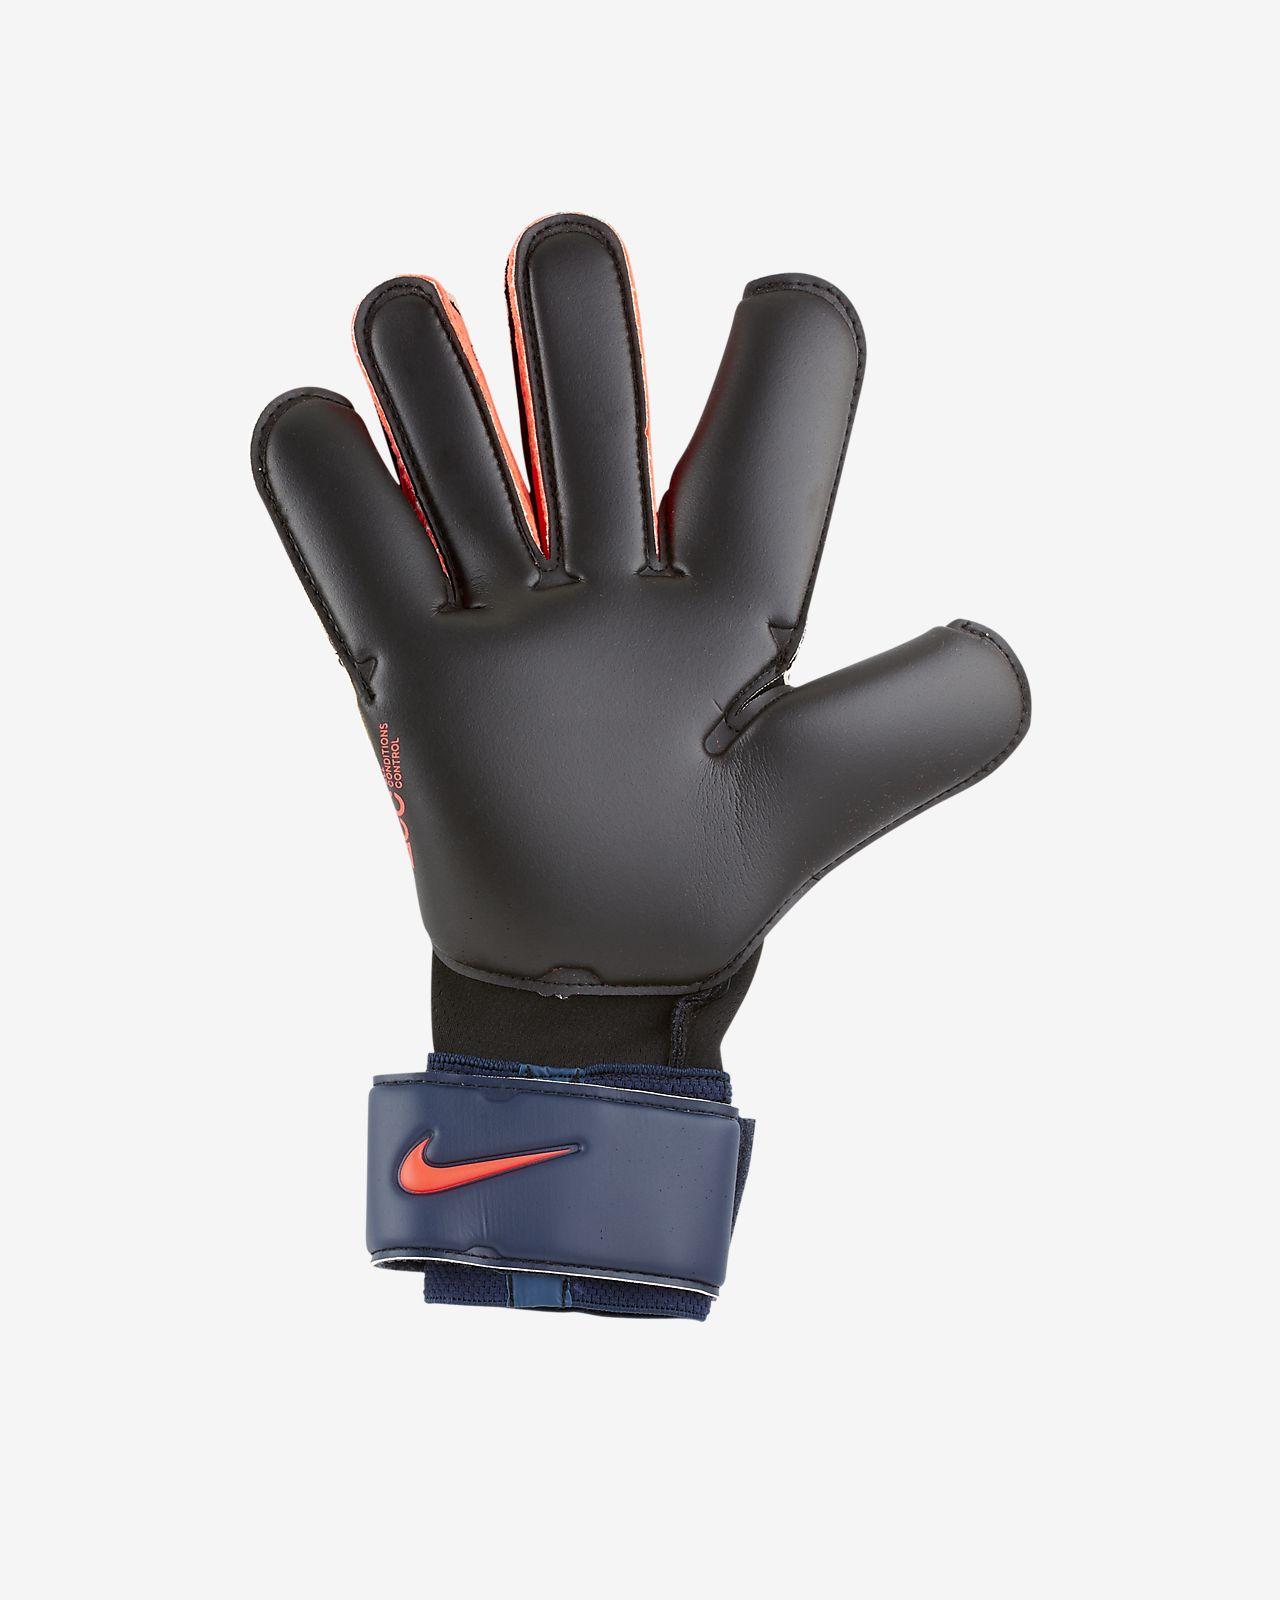 4afce8b19 Nike Grip3 Goalkeeper Vapor Strike Night Football Gloves. Nike.com ZA